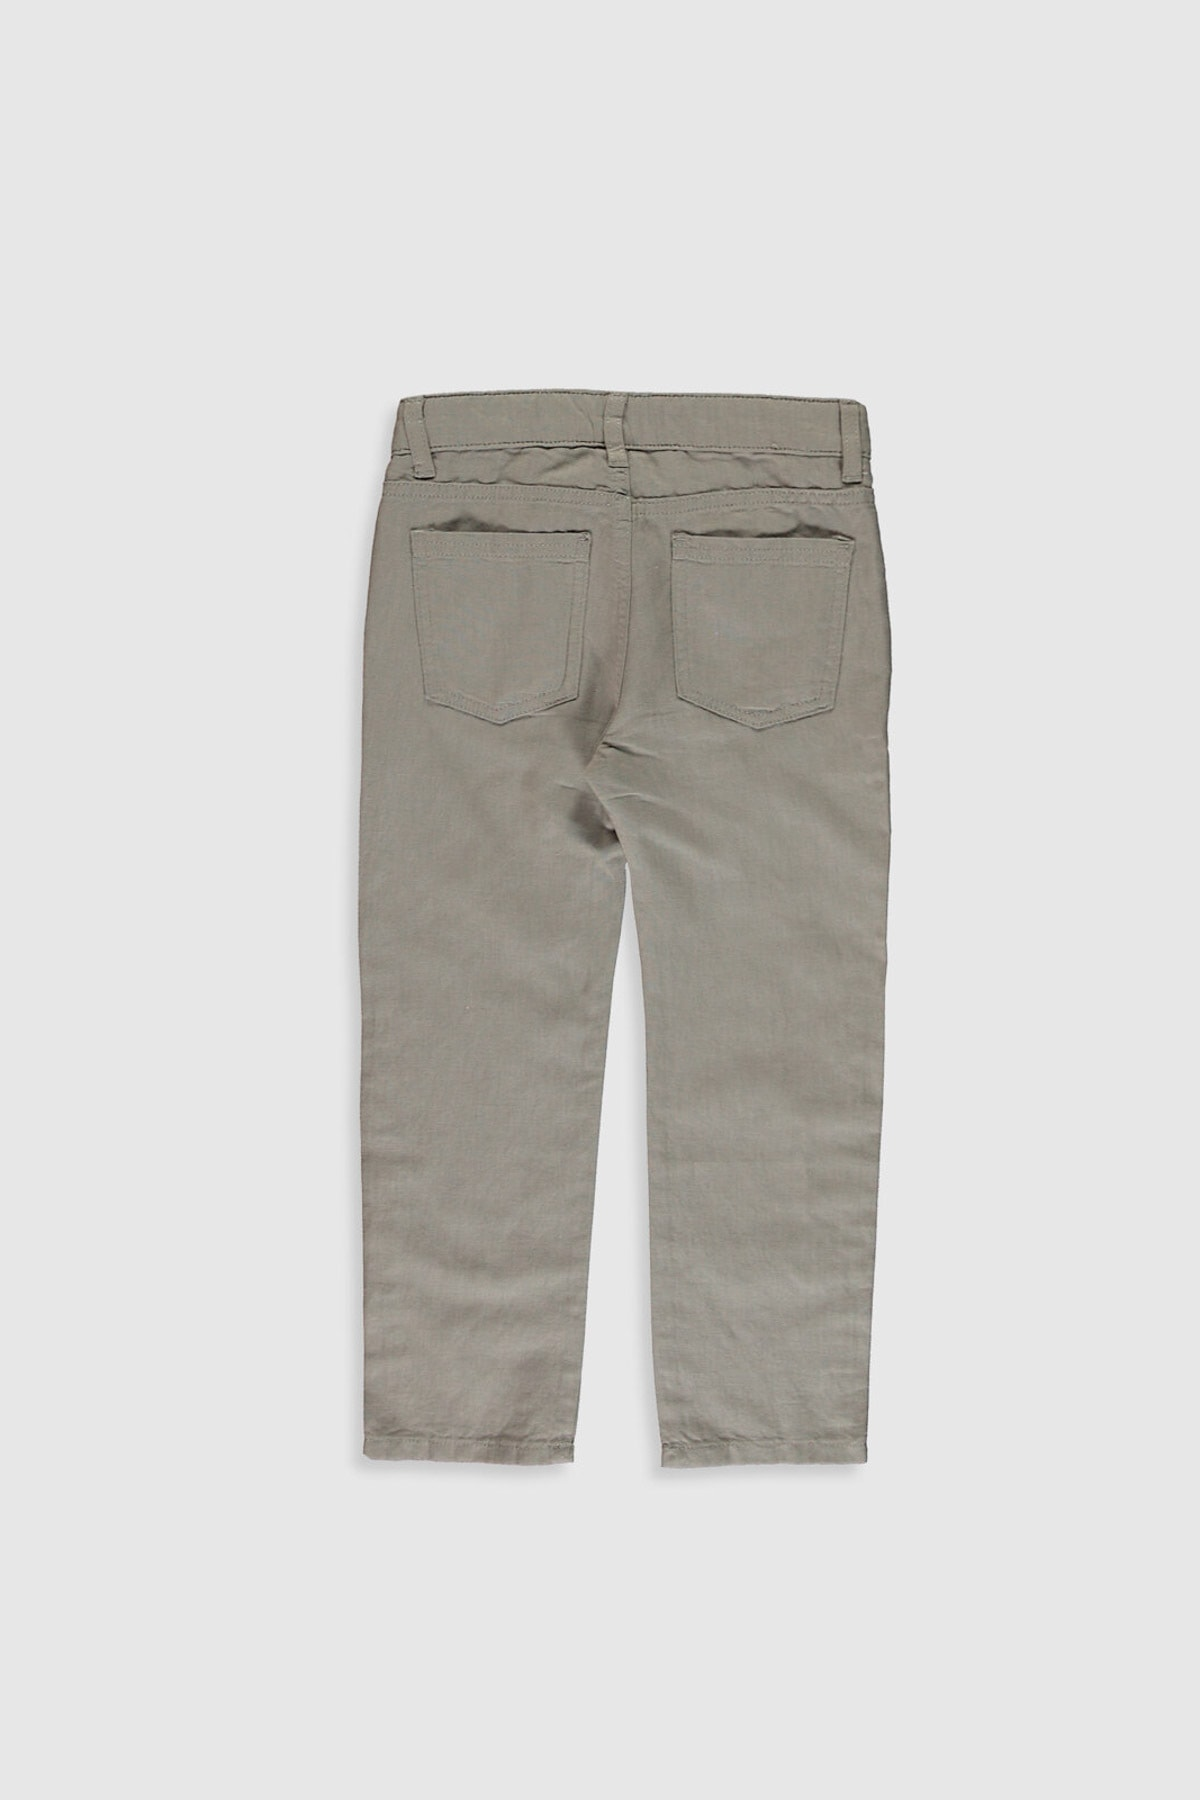 LC Waikiki Erkek Çocuk Bej Cr8 Pantolon 2